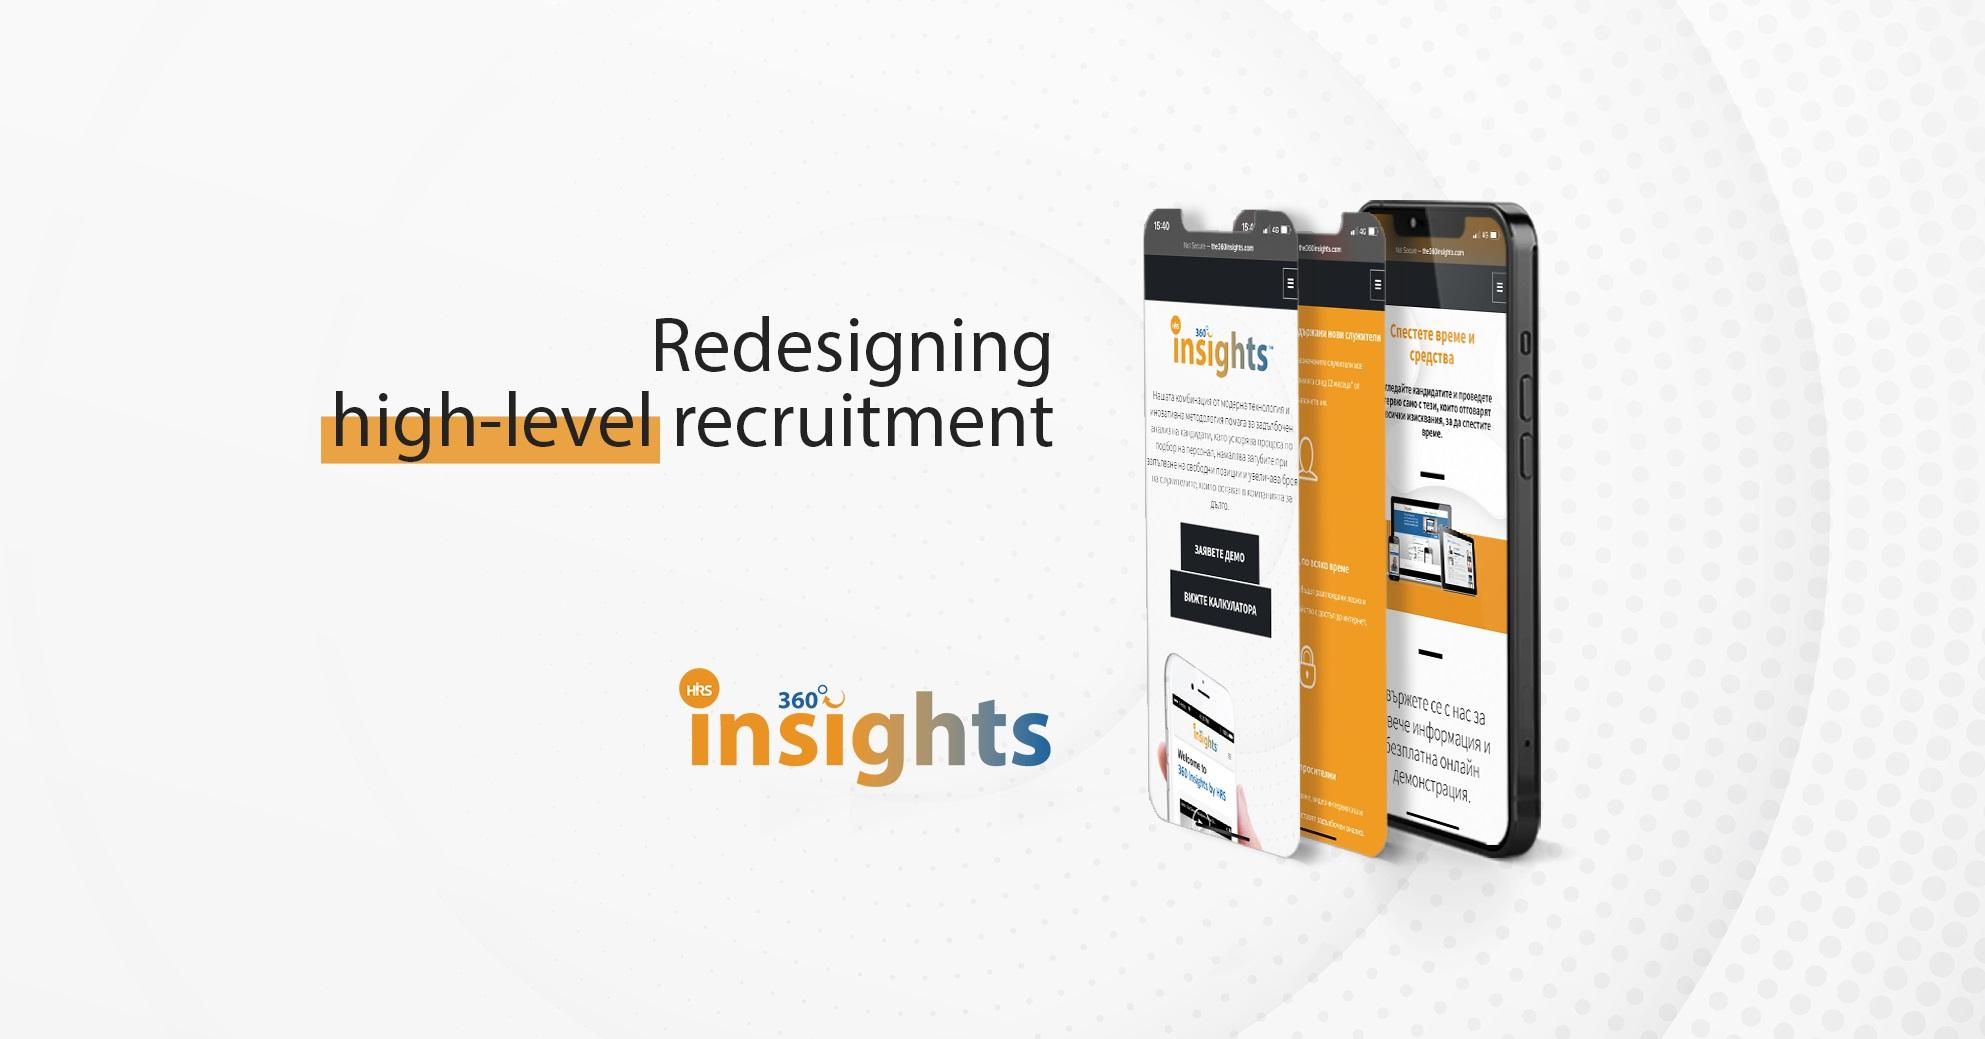 HR процес гарантира почти 100% успеваемост при подбора на кандидати 28